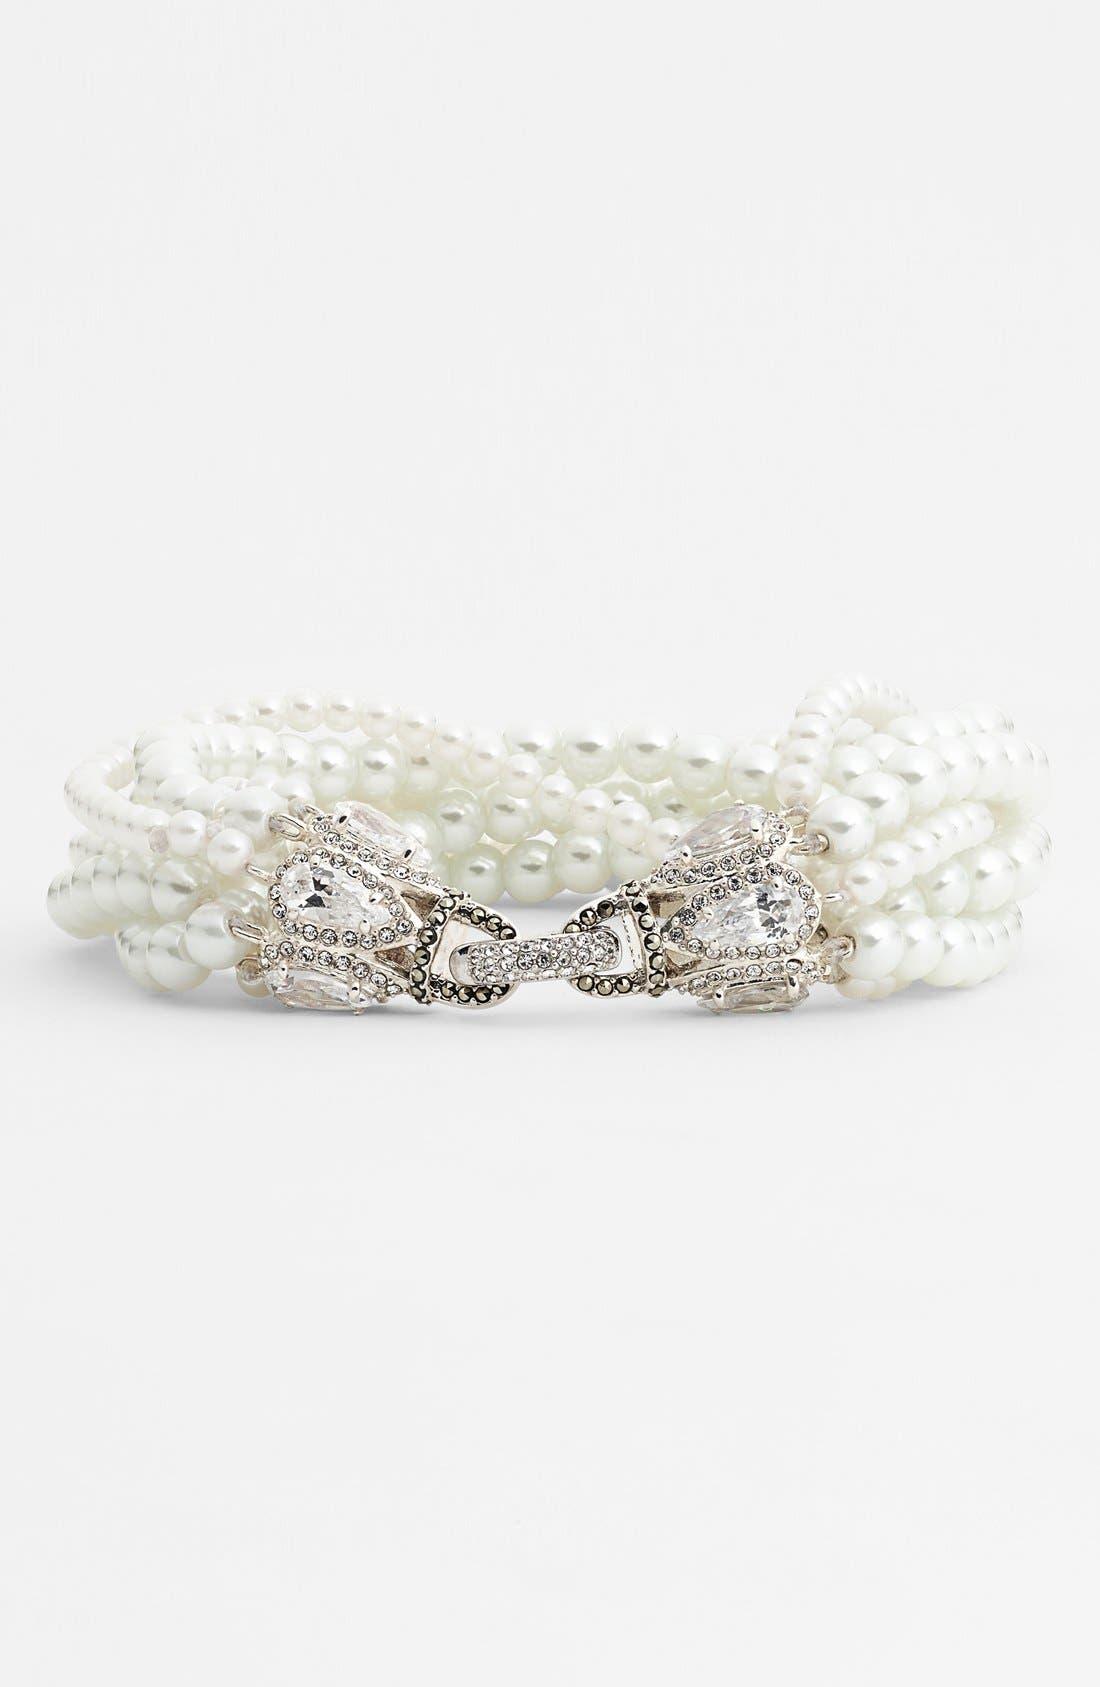 Main Image - Judith Jack 'Pearl Romance' Faux Pearl Bracelet